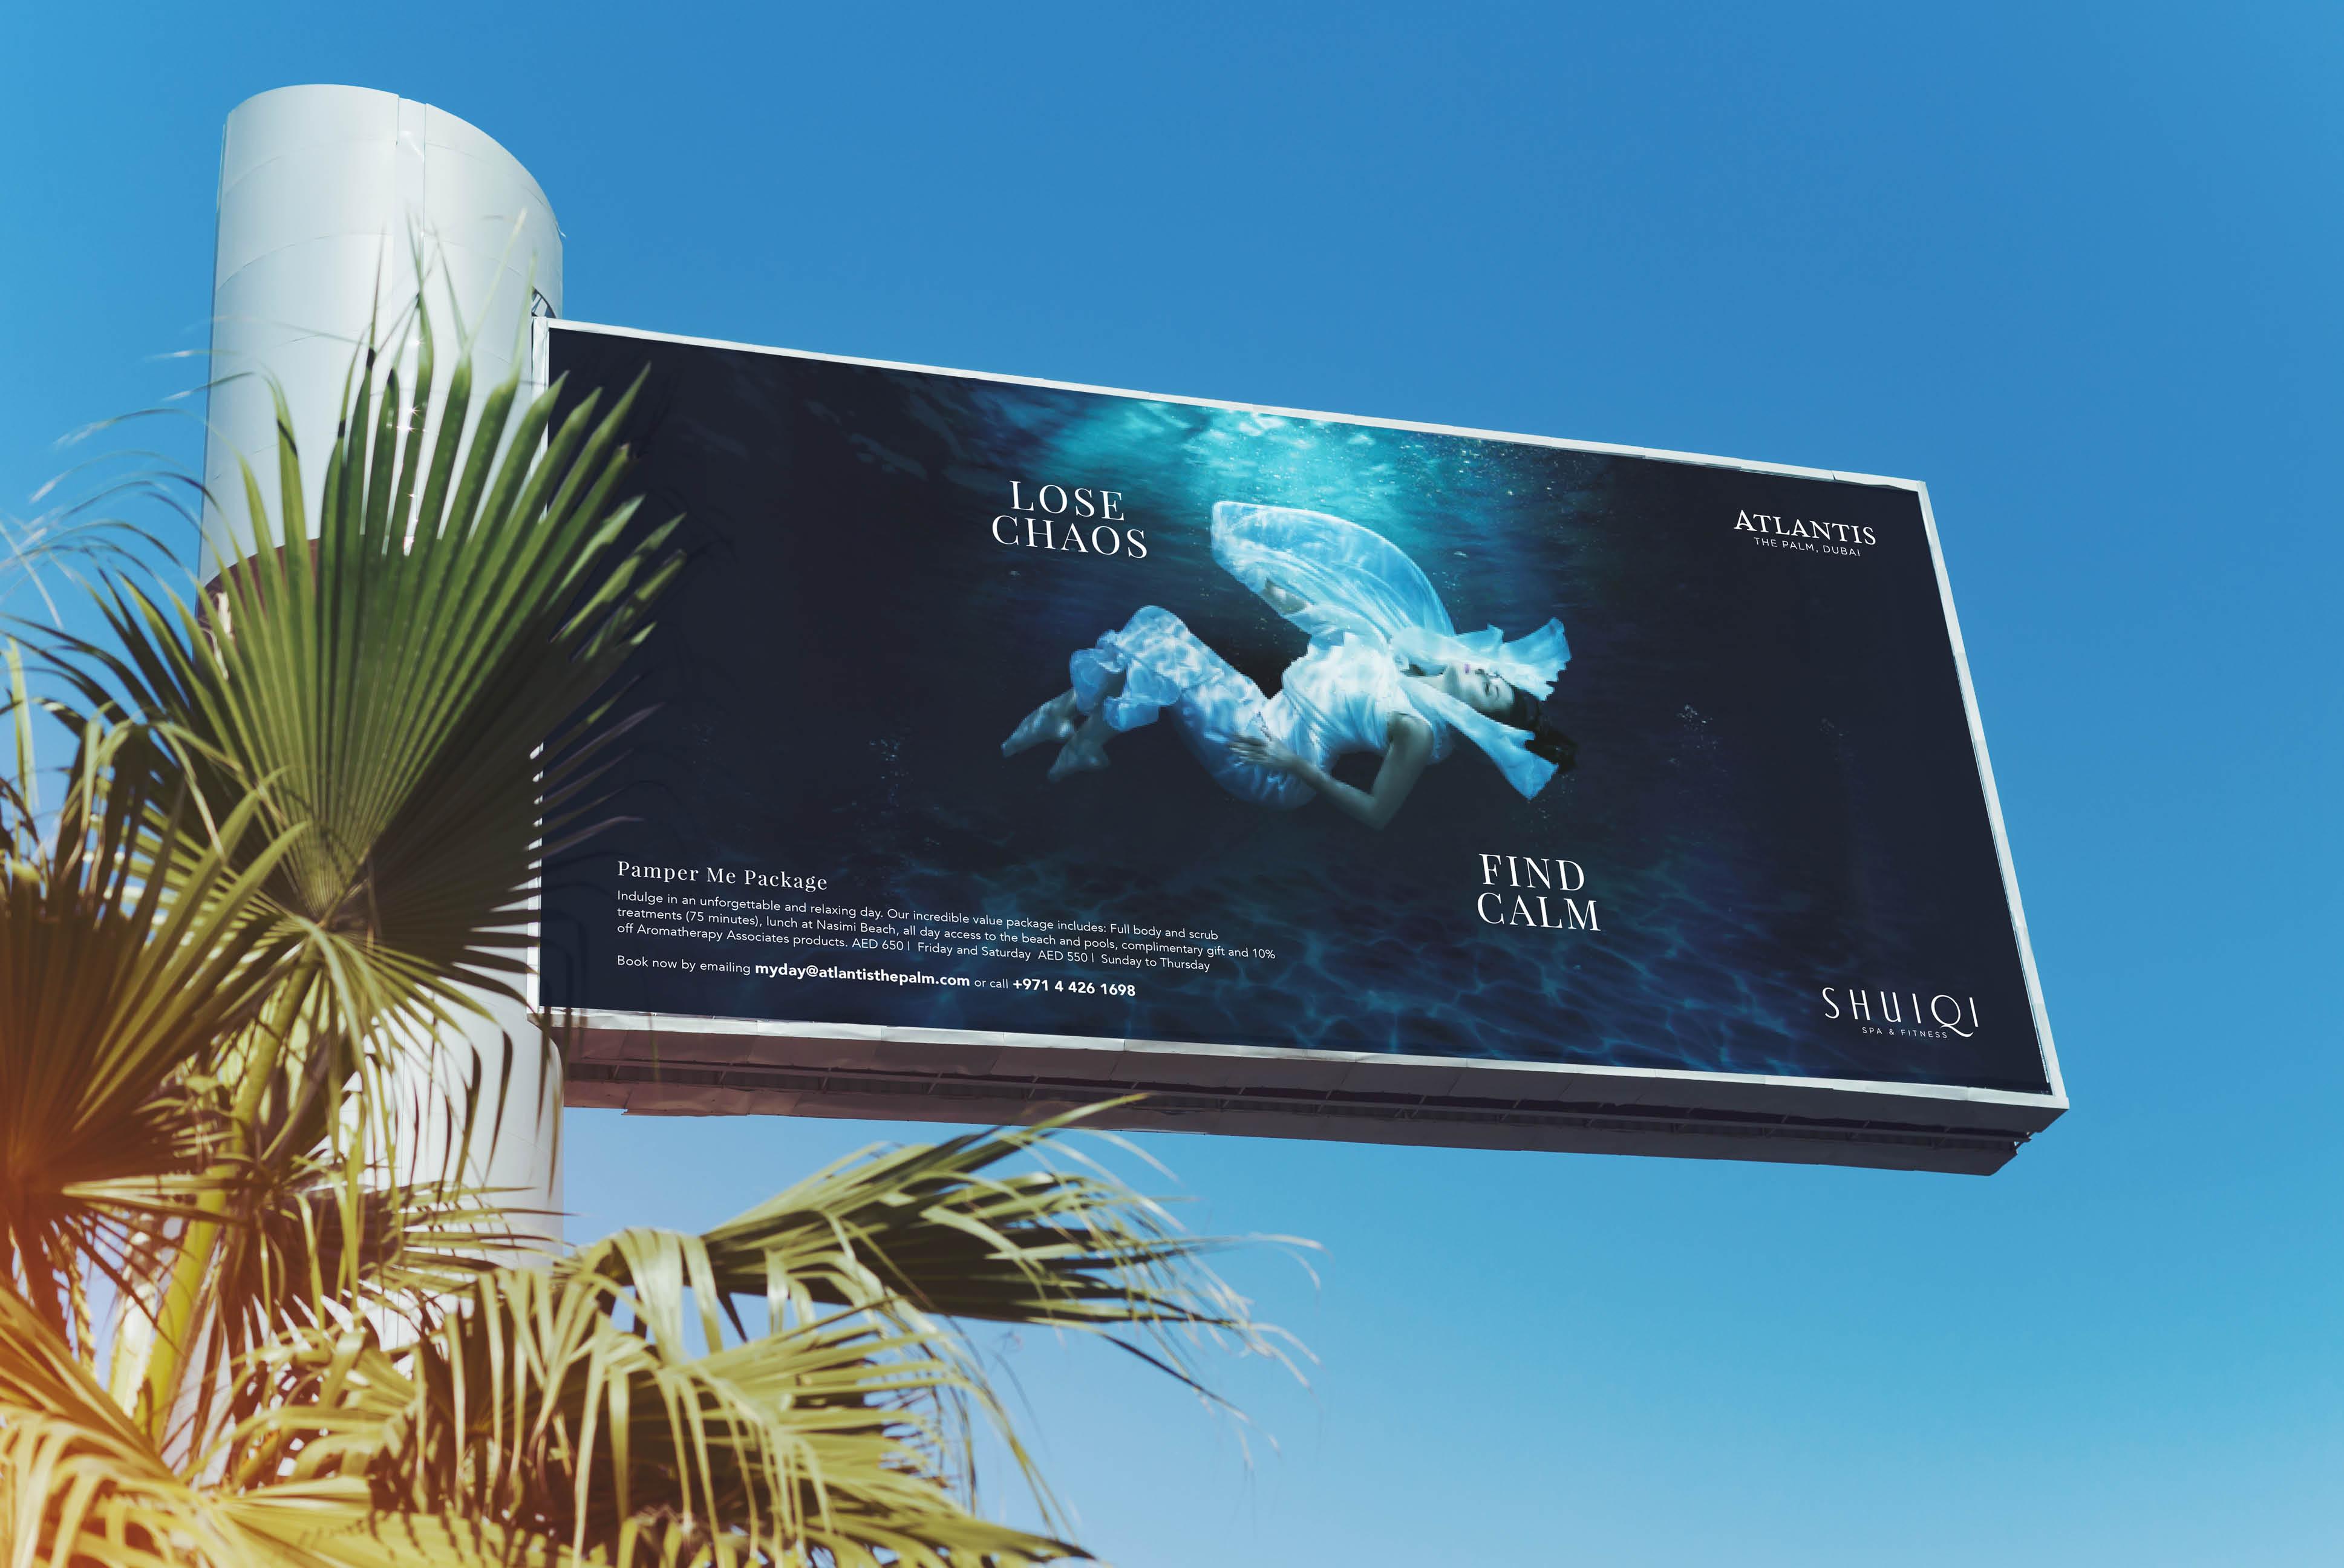 Atlantis Shuiqi Spa | Creative Advertising Campaign | independent Marketing | IM Dubai